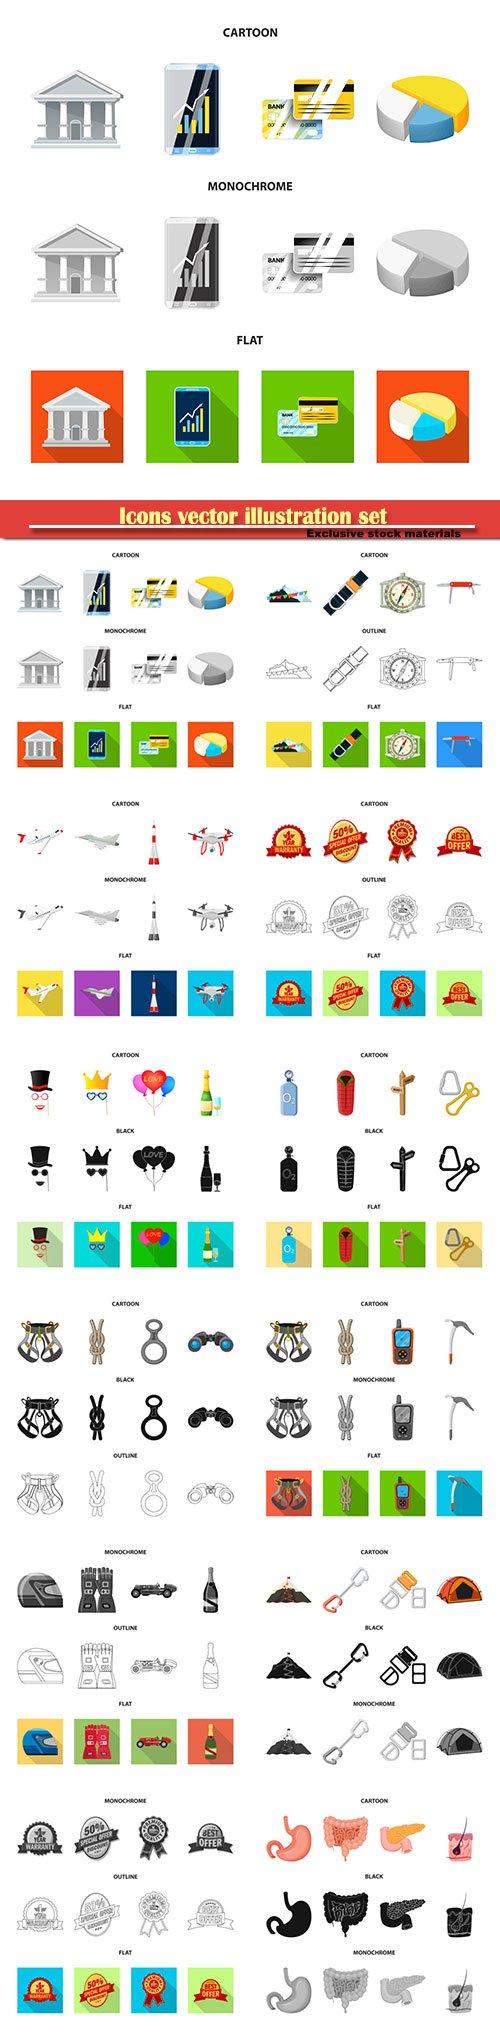 Icons vector illustration set # 11